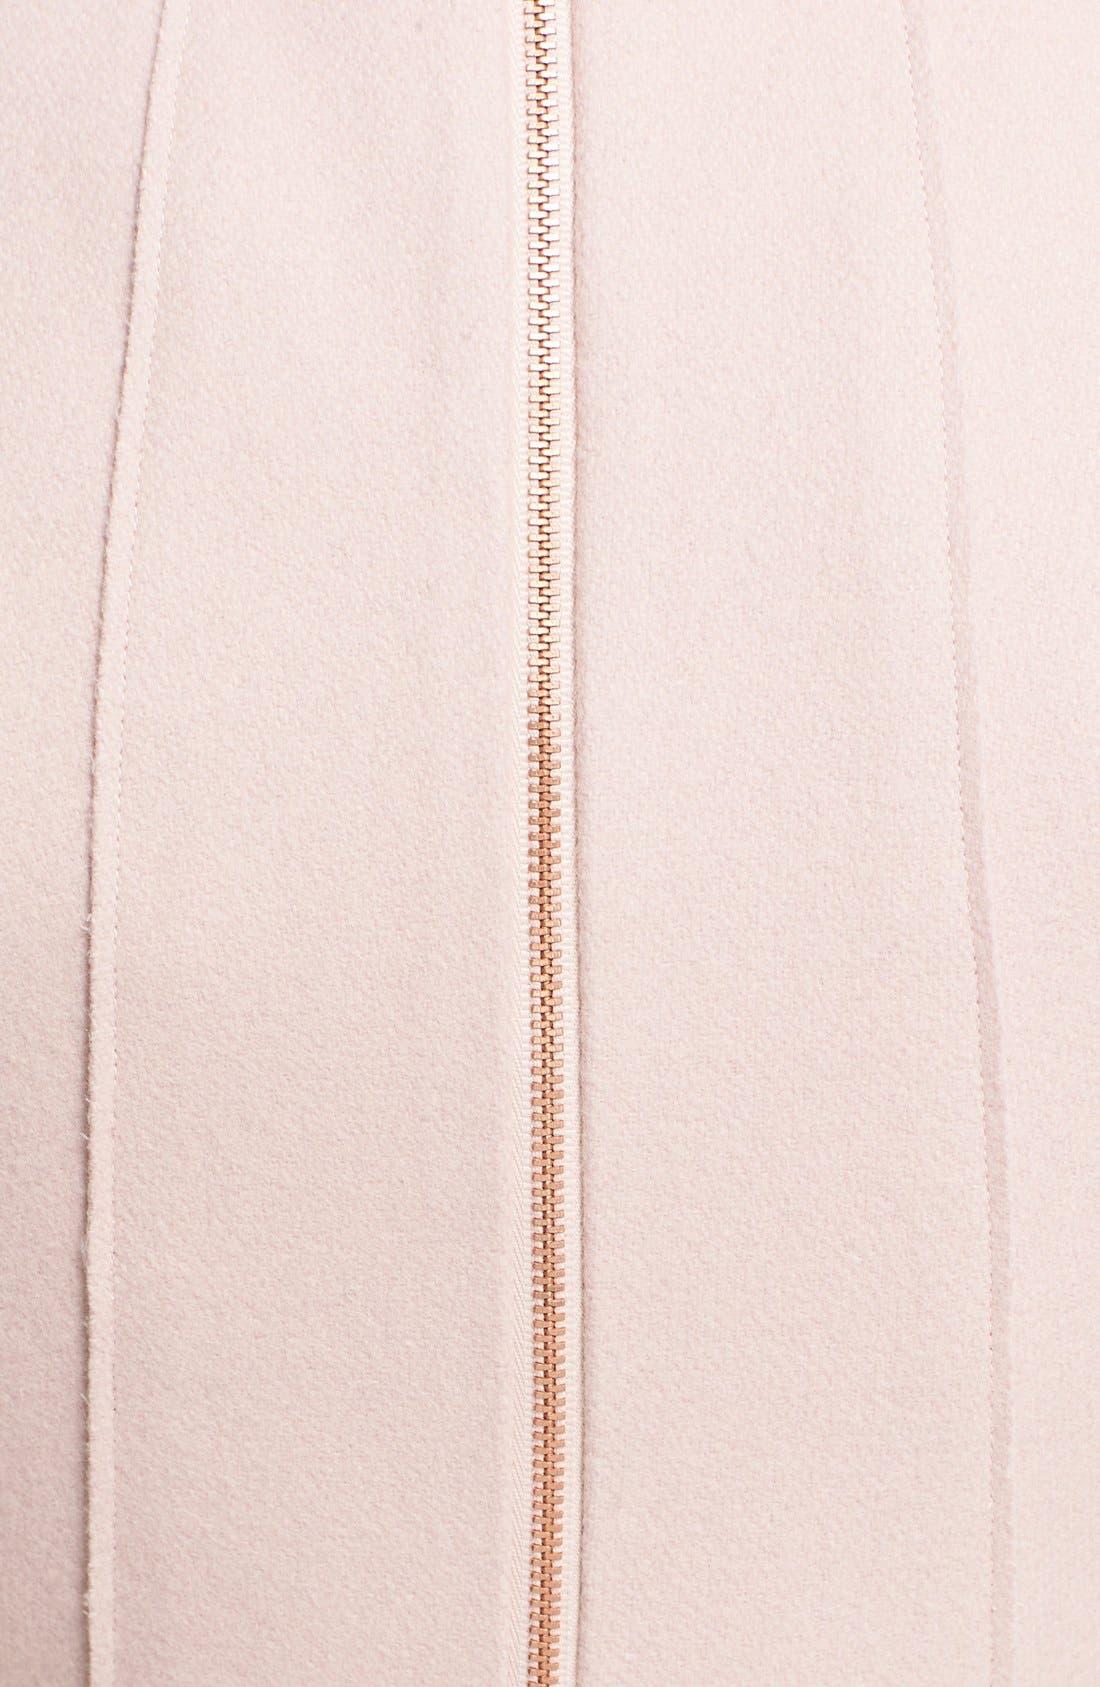 Alternate Image 2  - Ted Baker London 'Coralen' Structured Wool Blend Sheath Dress